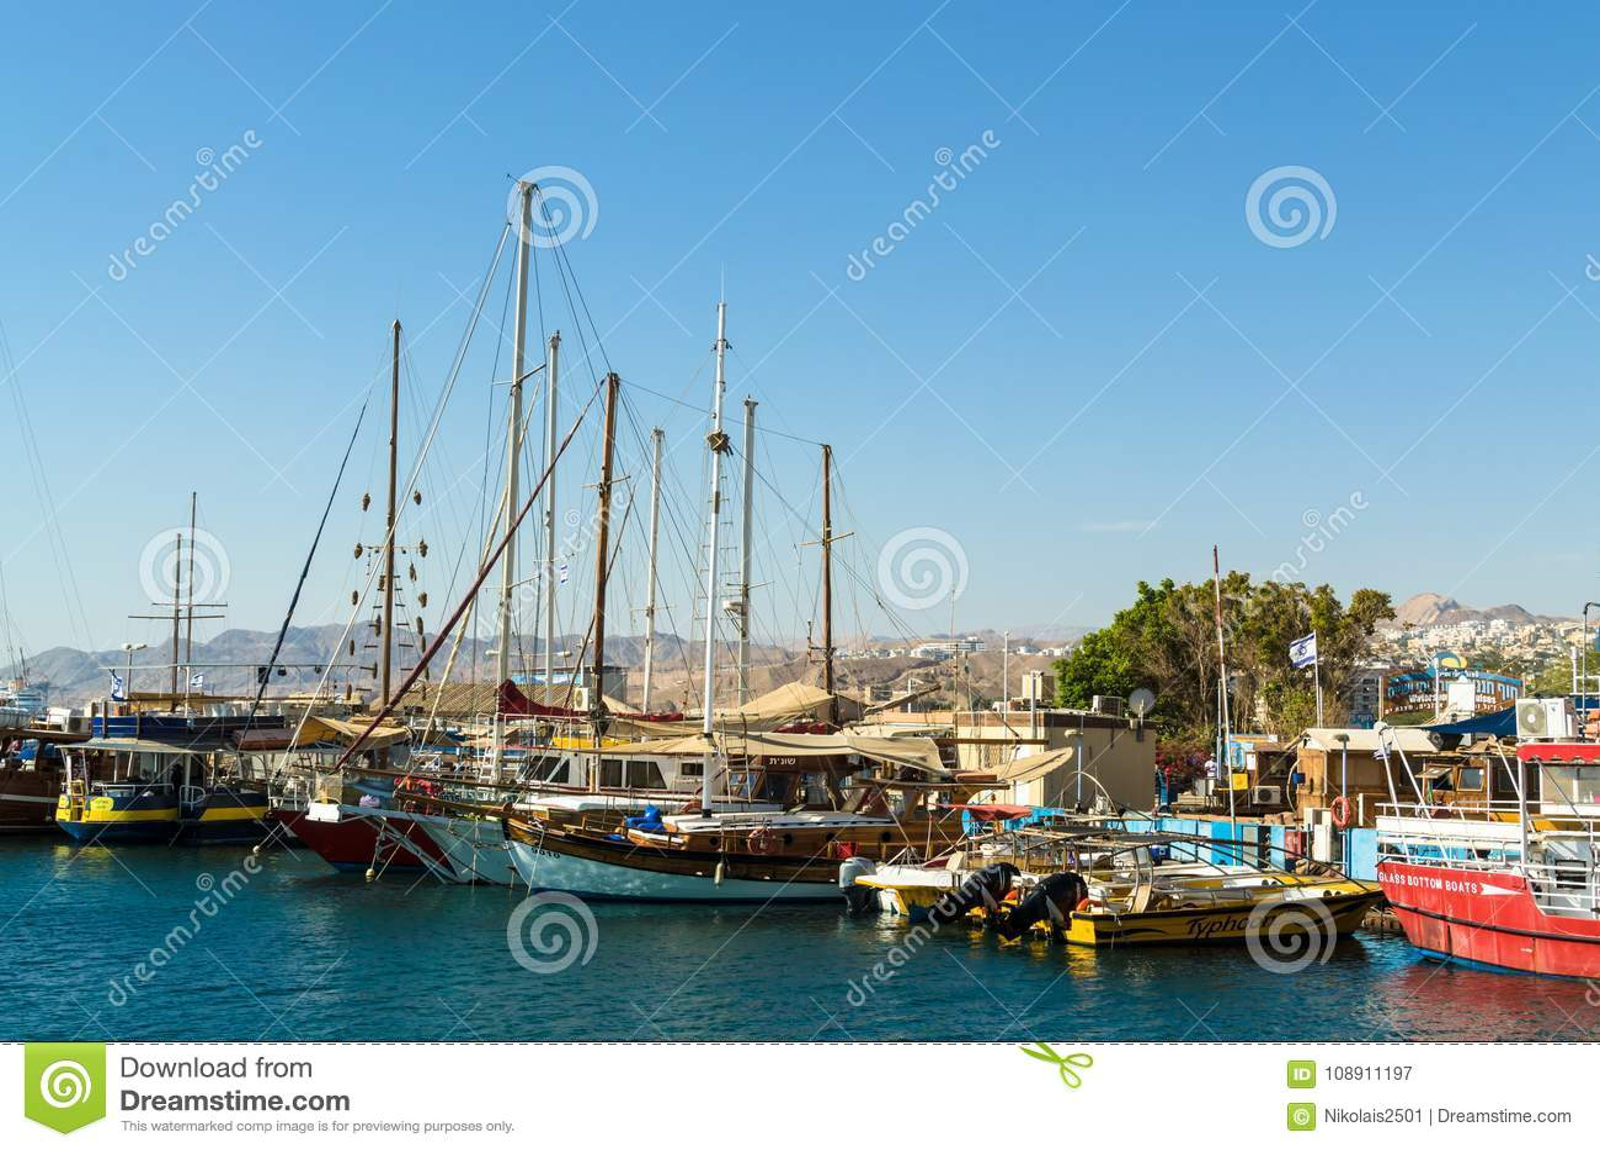 EILAT, ISRAEL – November 7, 2017: Marina with docked yachts and boats